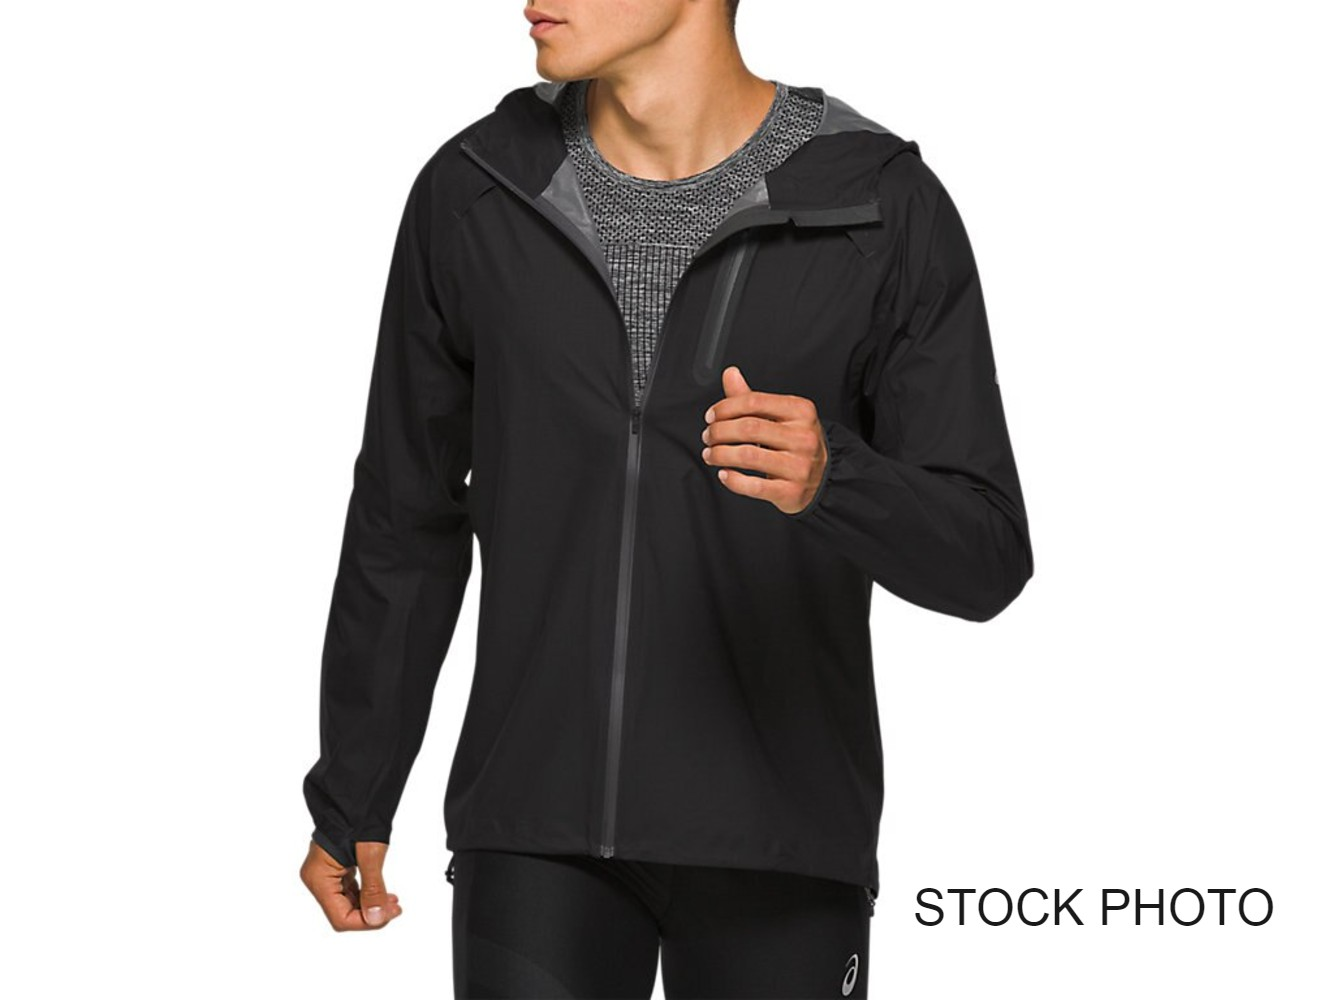 ASICS - Asics Men's Waterproof Running Jacket, Black, 3XL - Walmart.com